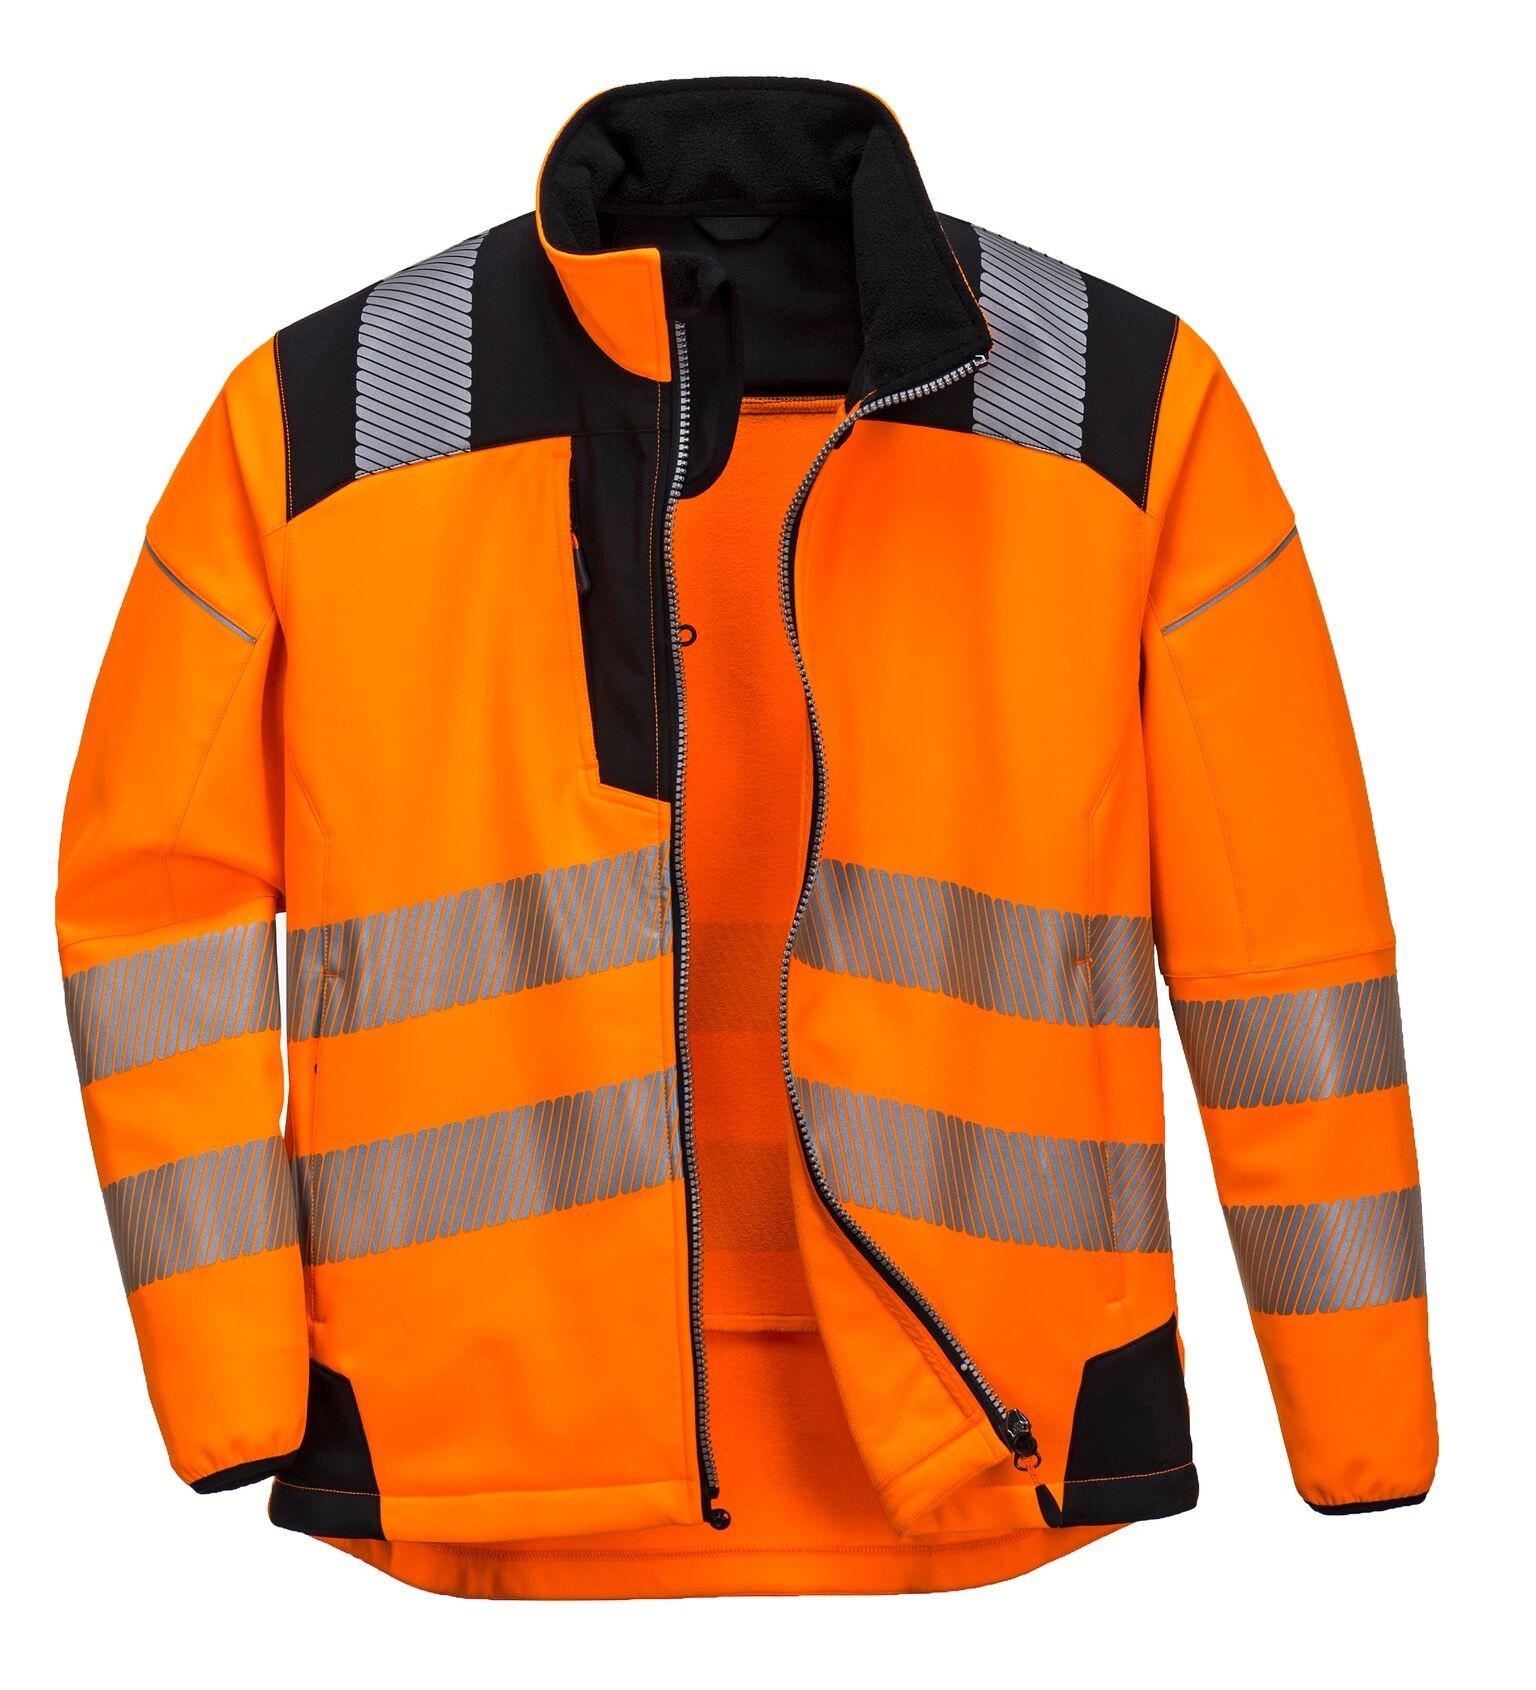 Vison Hi Viz Softshell jacket Orange